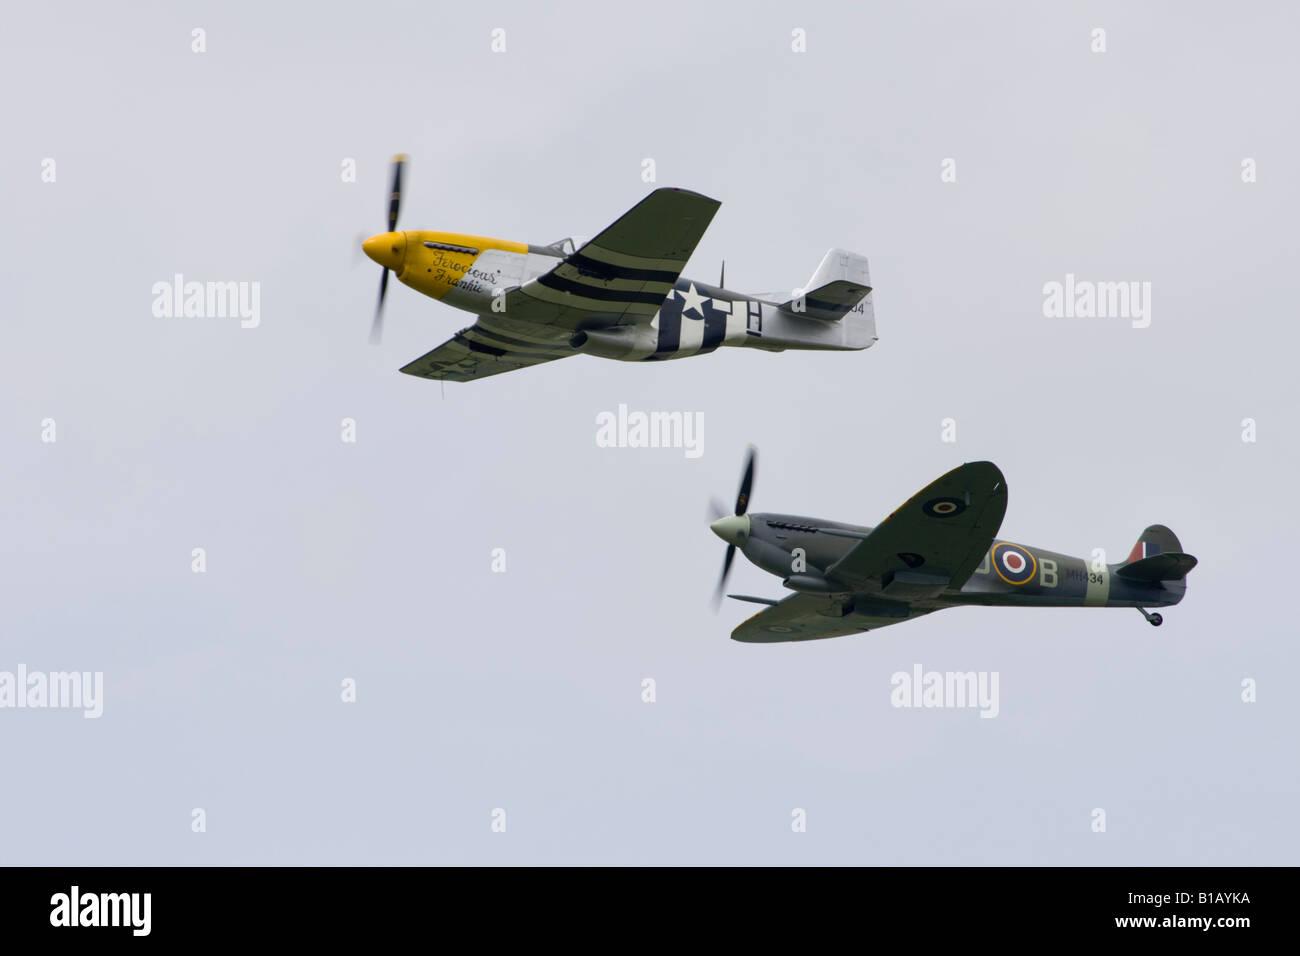 P51 Mustang 'Ferocious Frankie' & Spitfire Mk IX MH434 perform at the Biggin Hill Air Fair, Kent, England. - Stock Image